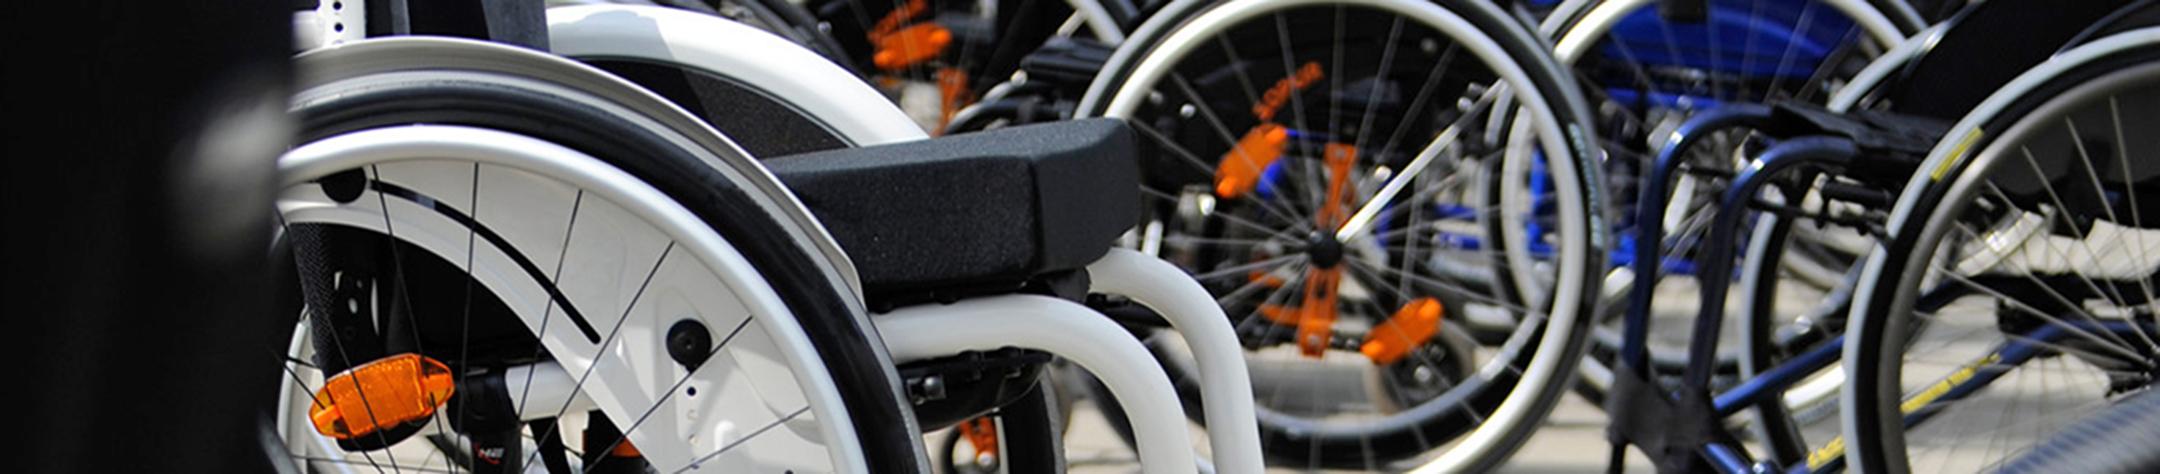 Rollstuhl-Sitz-Zentrum